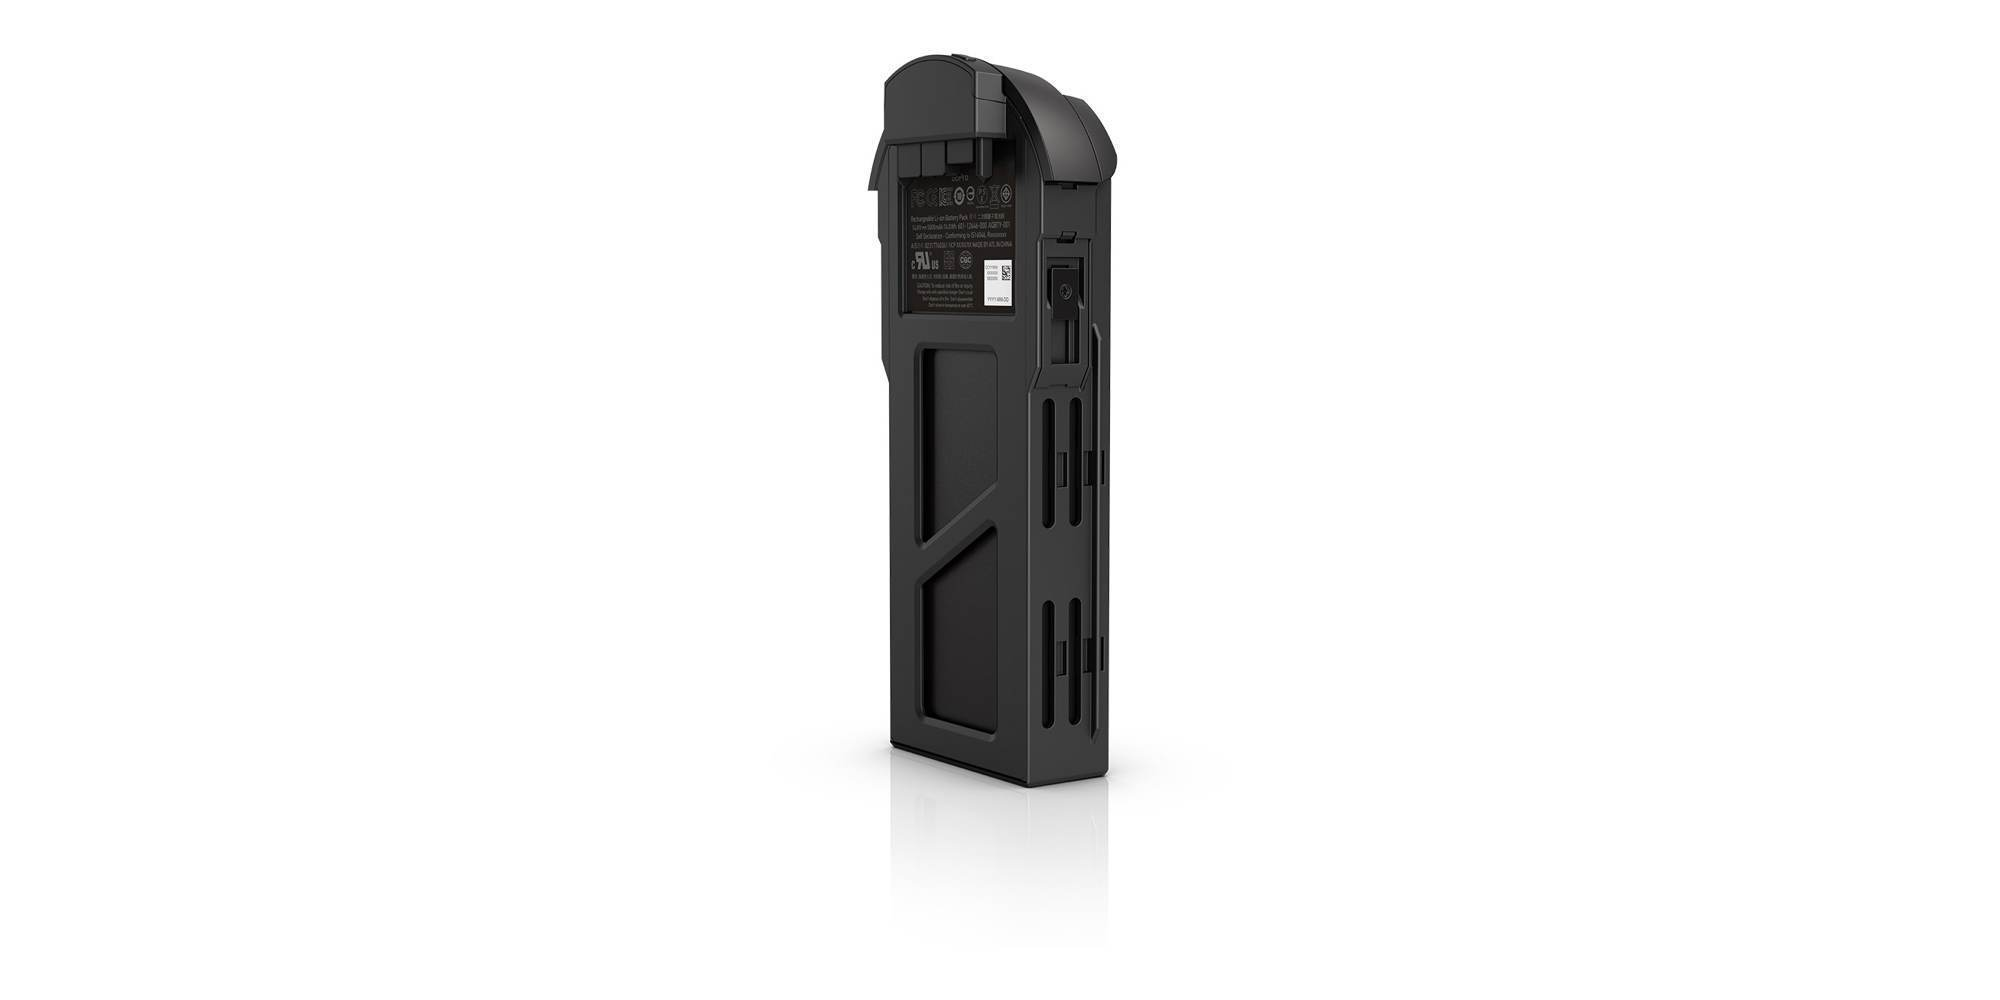 Аккумулятор GoPro Karma Battery (AQBTY-001) вид справа